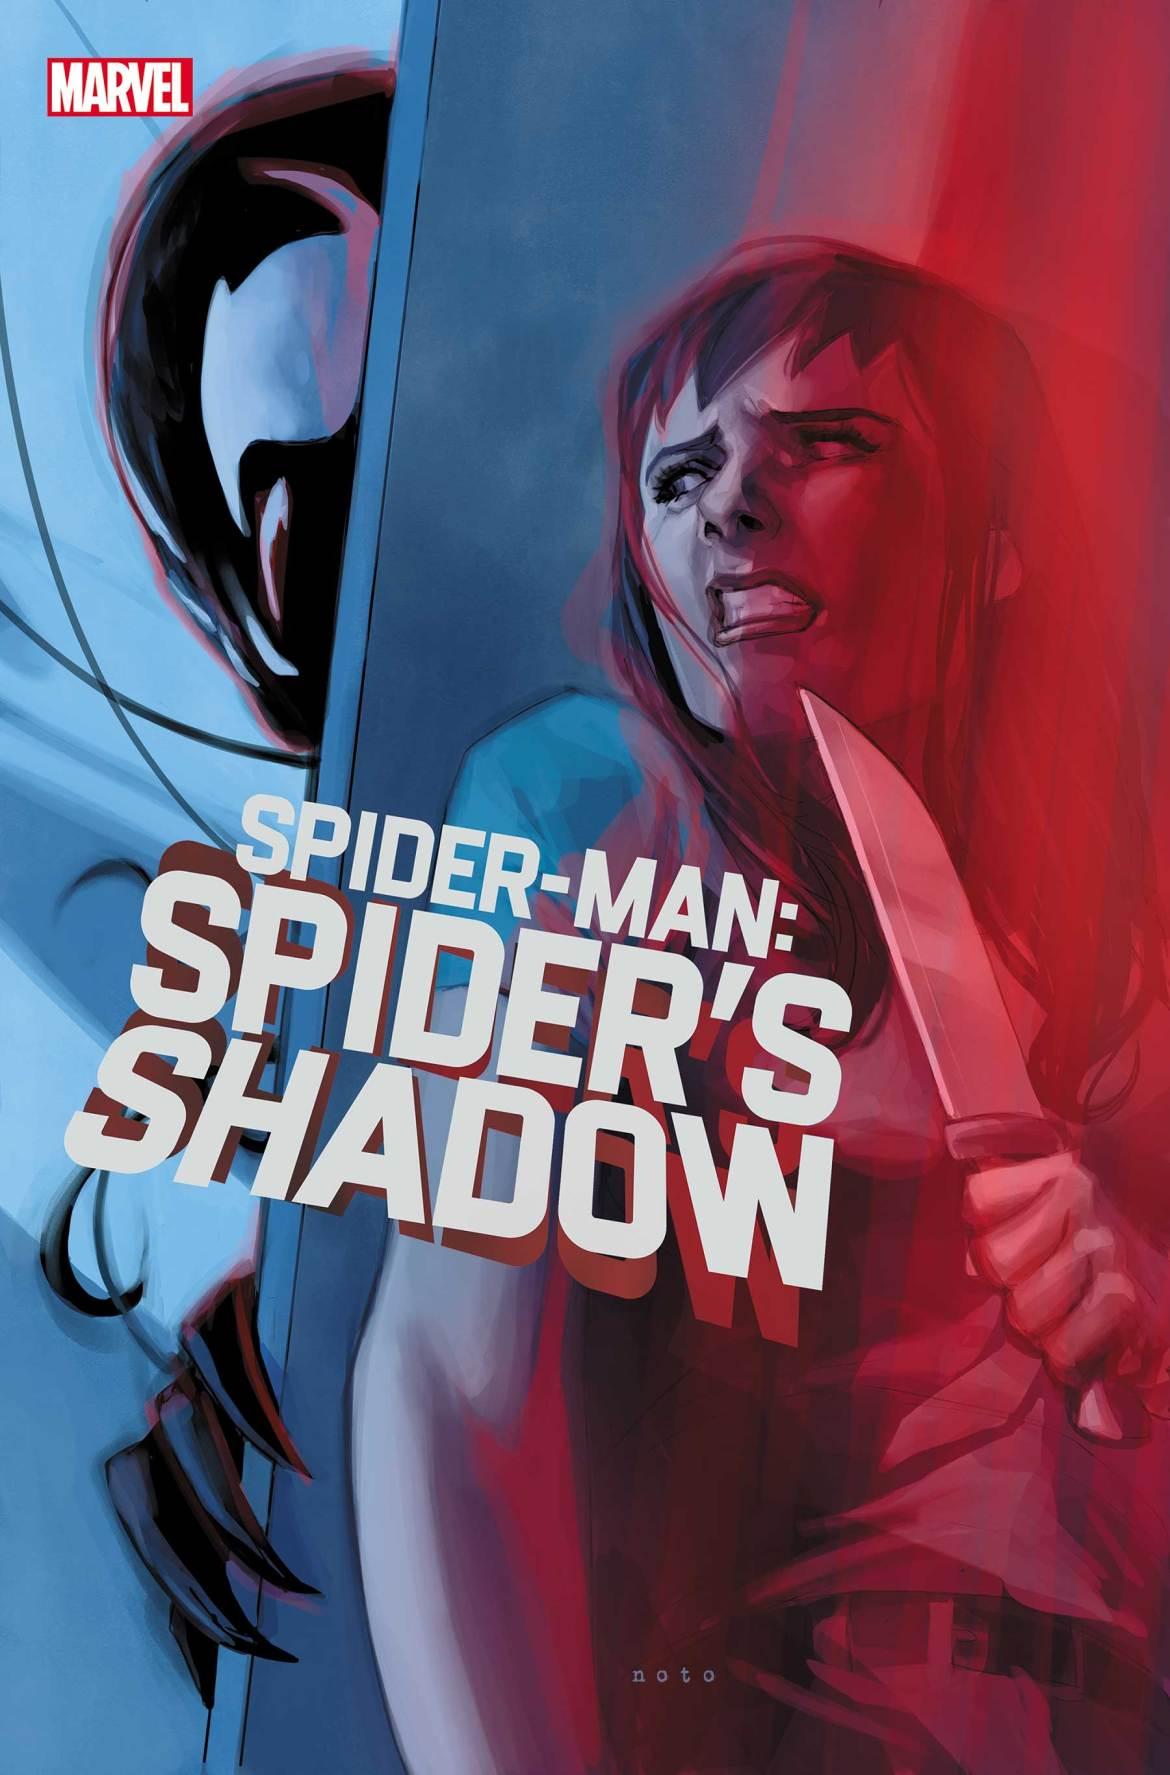 SMSPIDERSHADOW2021002_cov_logo Marvel Comics May 2021 Solicitations